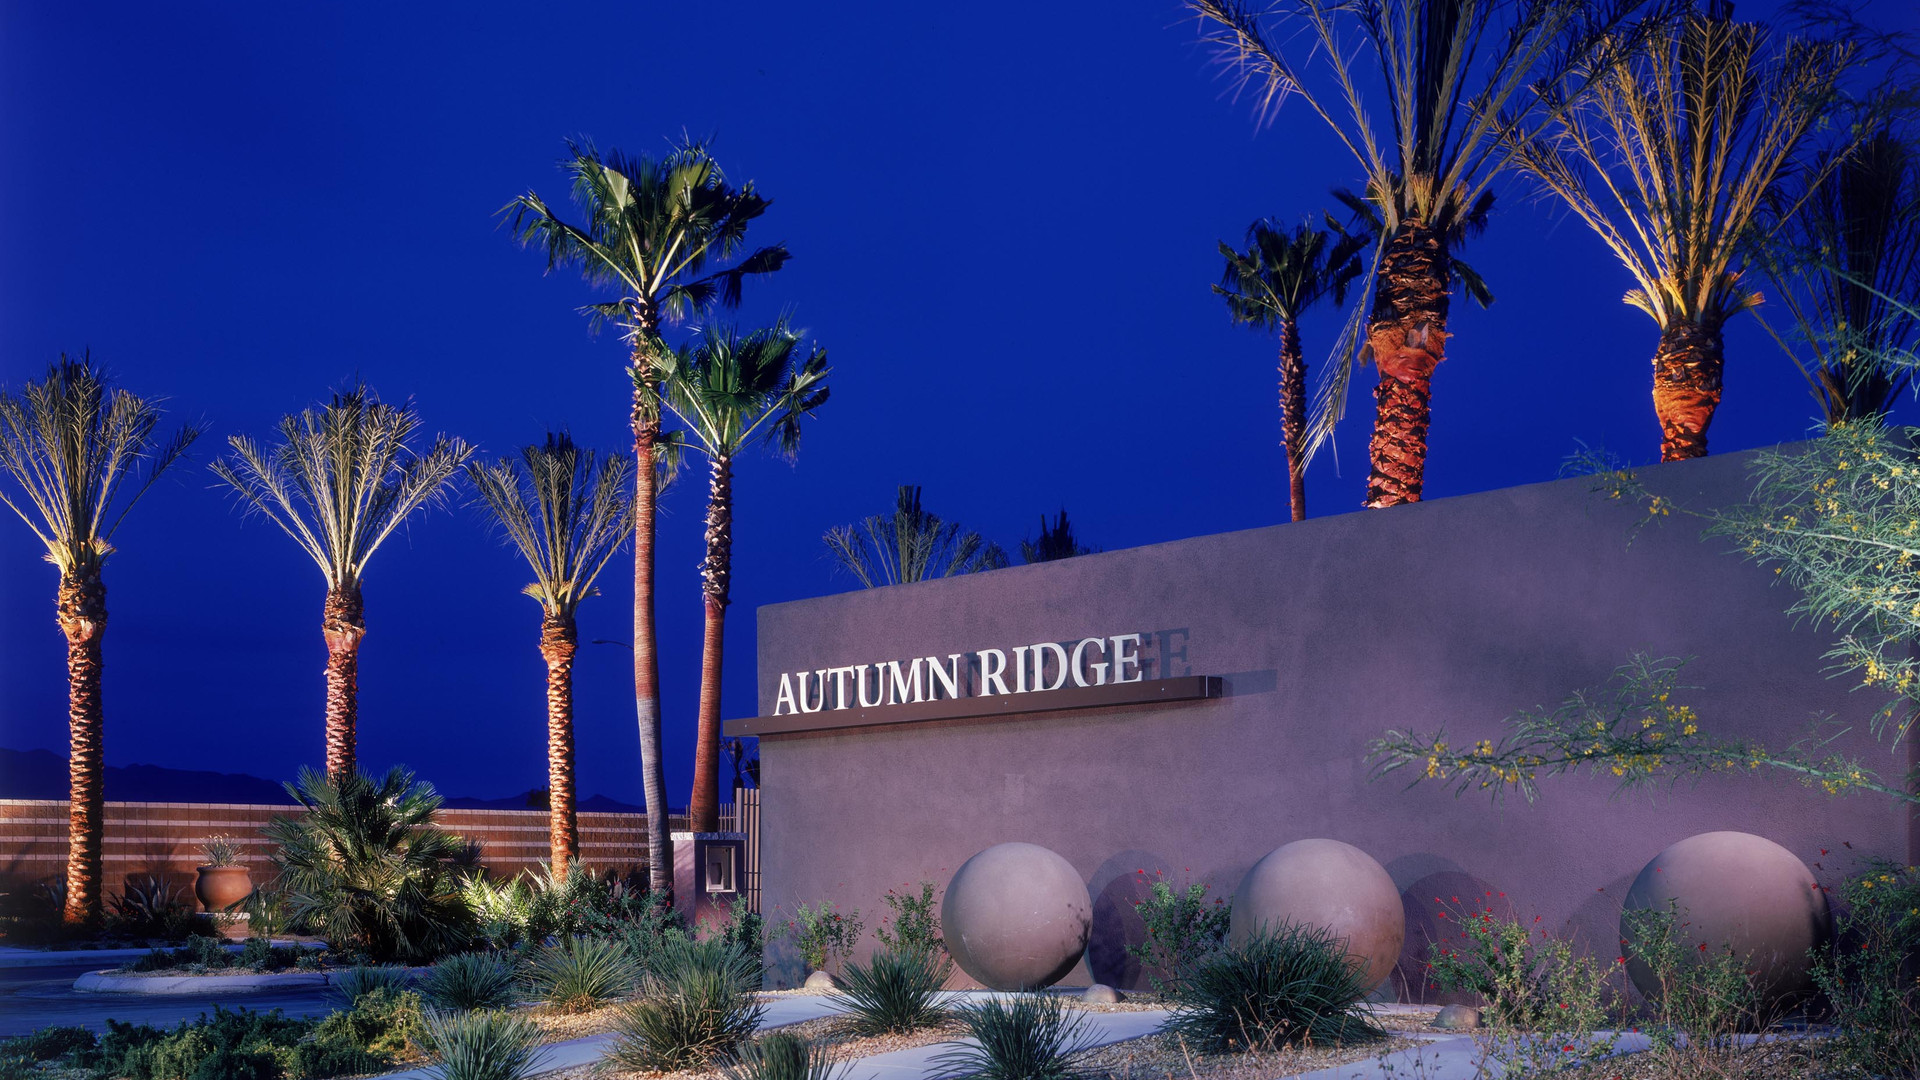 Autumn Ridge top dressing